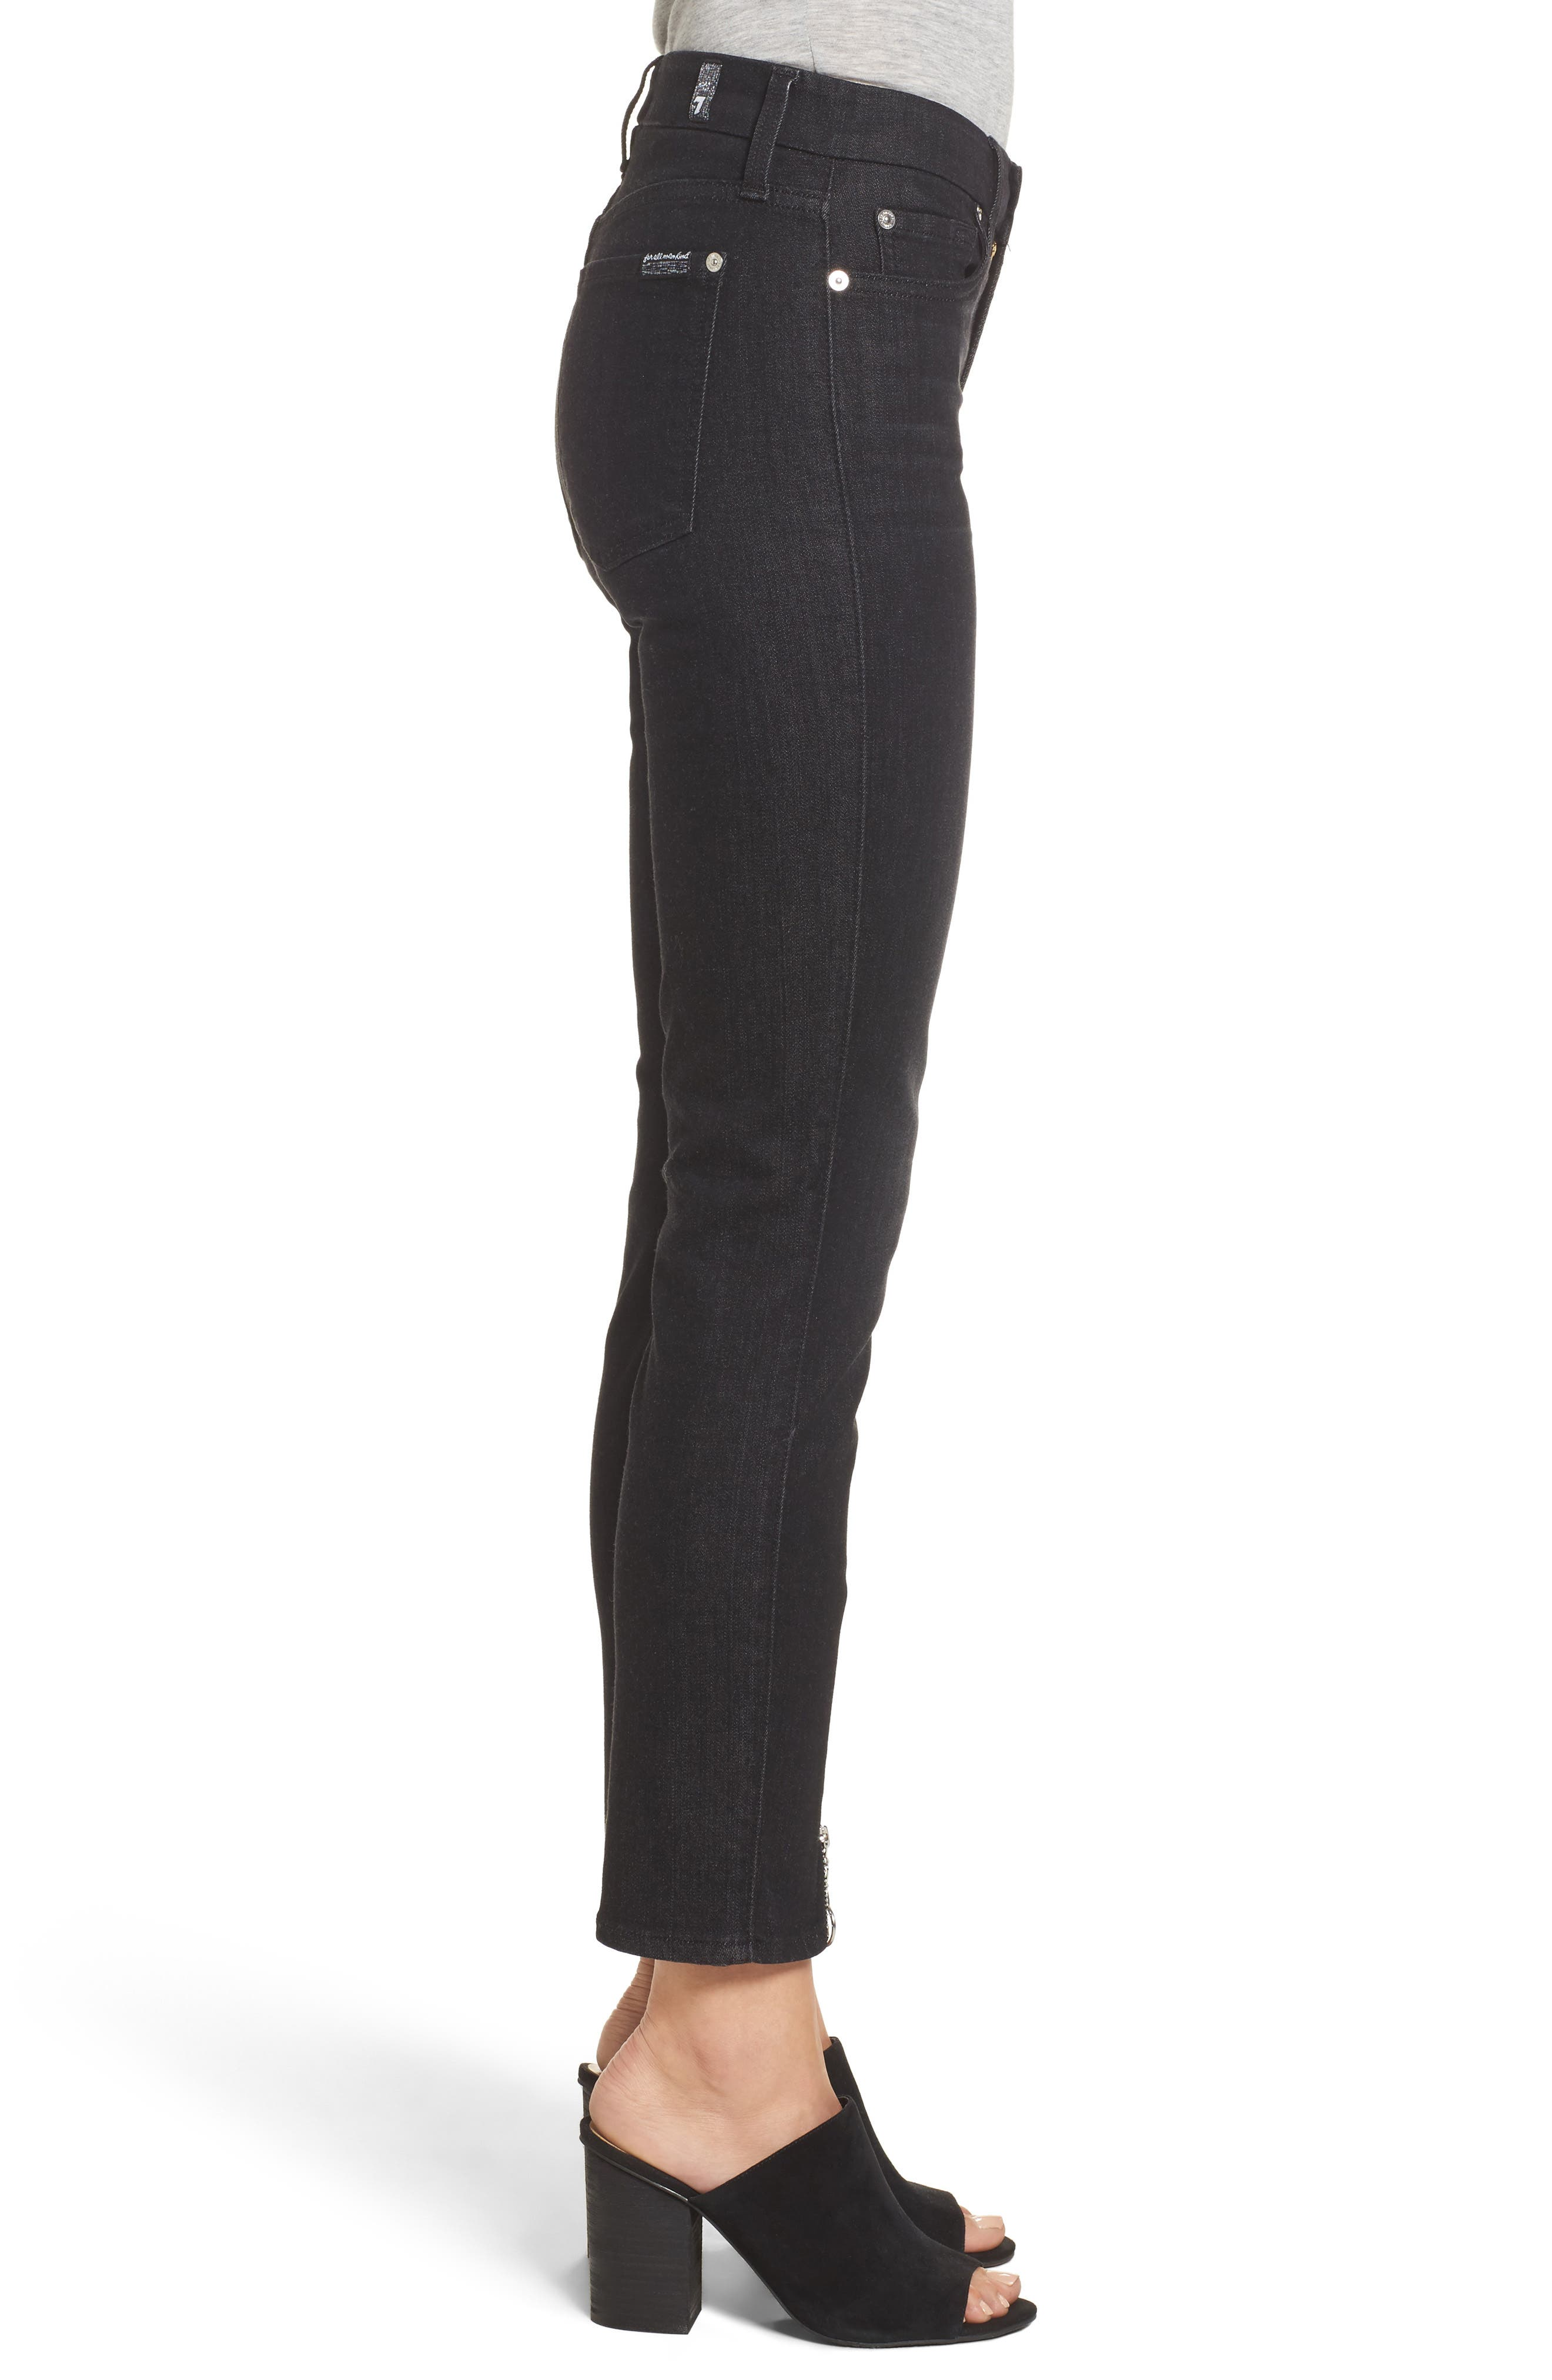 b(air) - Roxanne Ankle Zip Jeans,                             Alternate thumbnail 3, color,                             Bair Noir